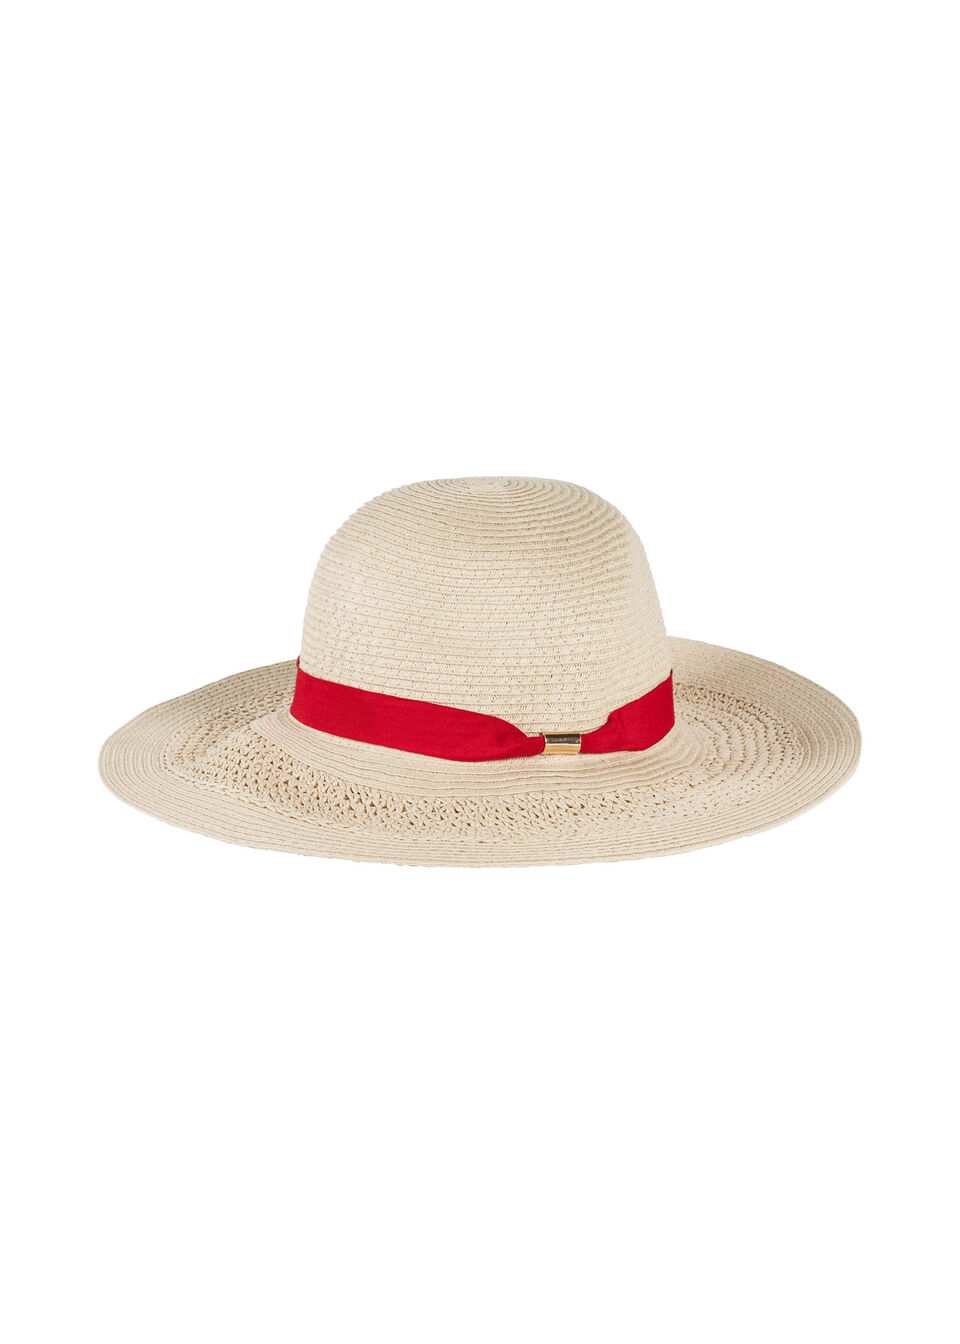 0f2f2c24e Slamené klobúky, klobuky na leto, damsky klobucik, letné klobúky ...